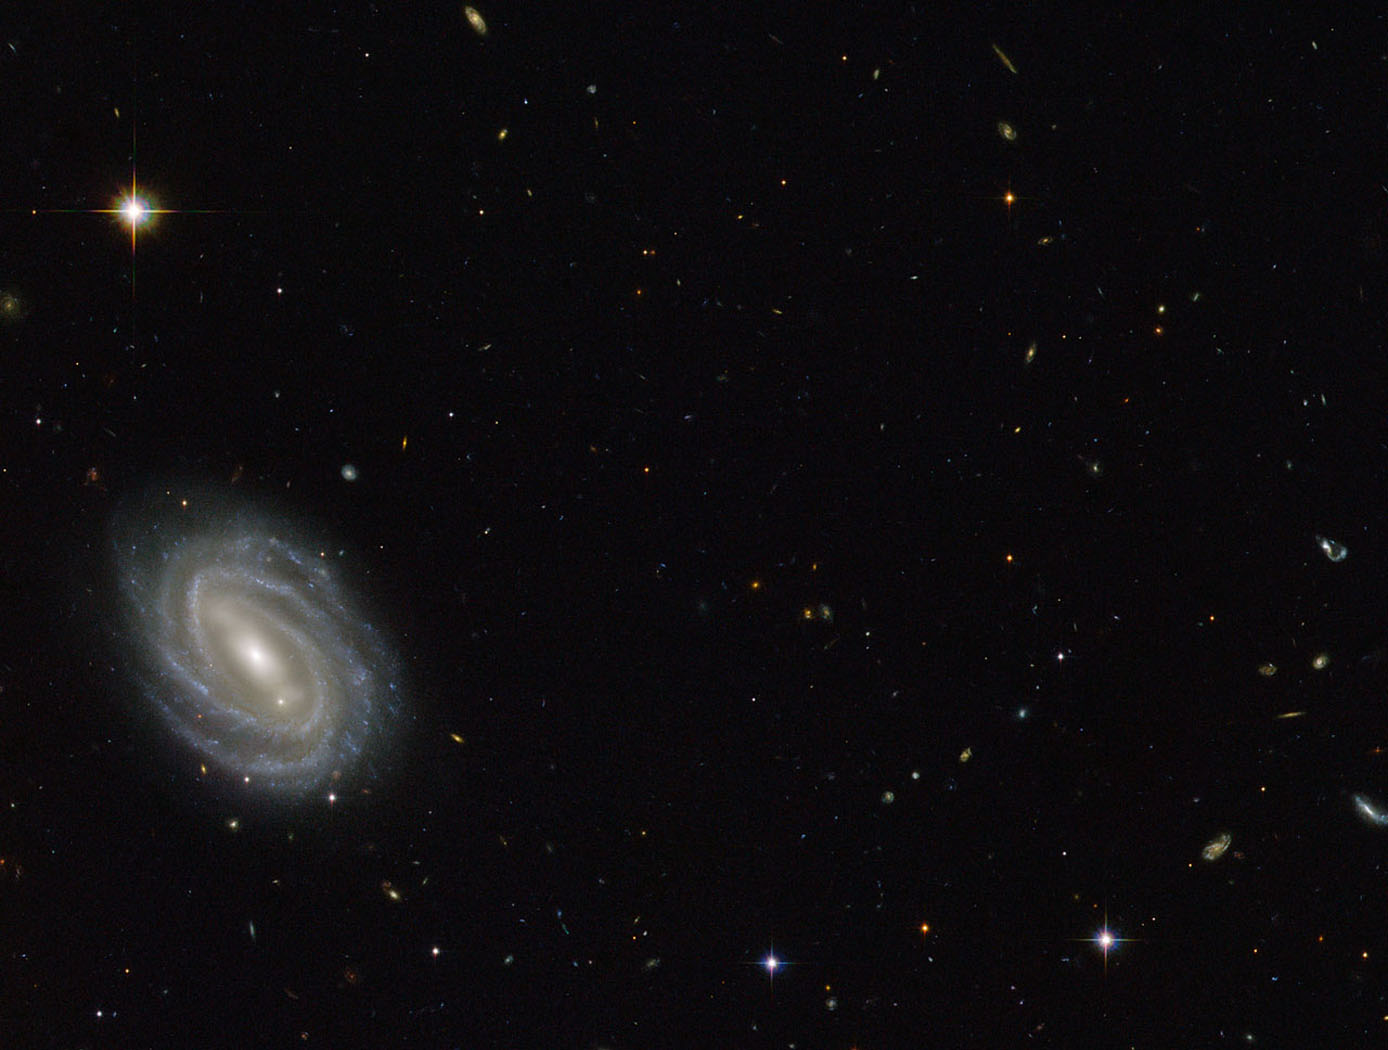 Hubble Sees Spiral in Serpens; Credit: ESA/Hubble & NASA,